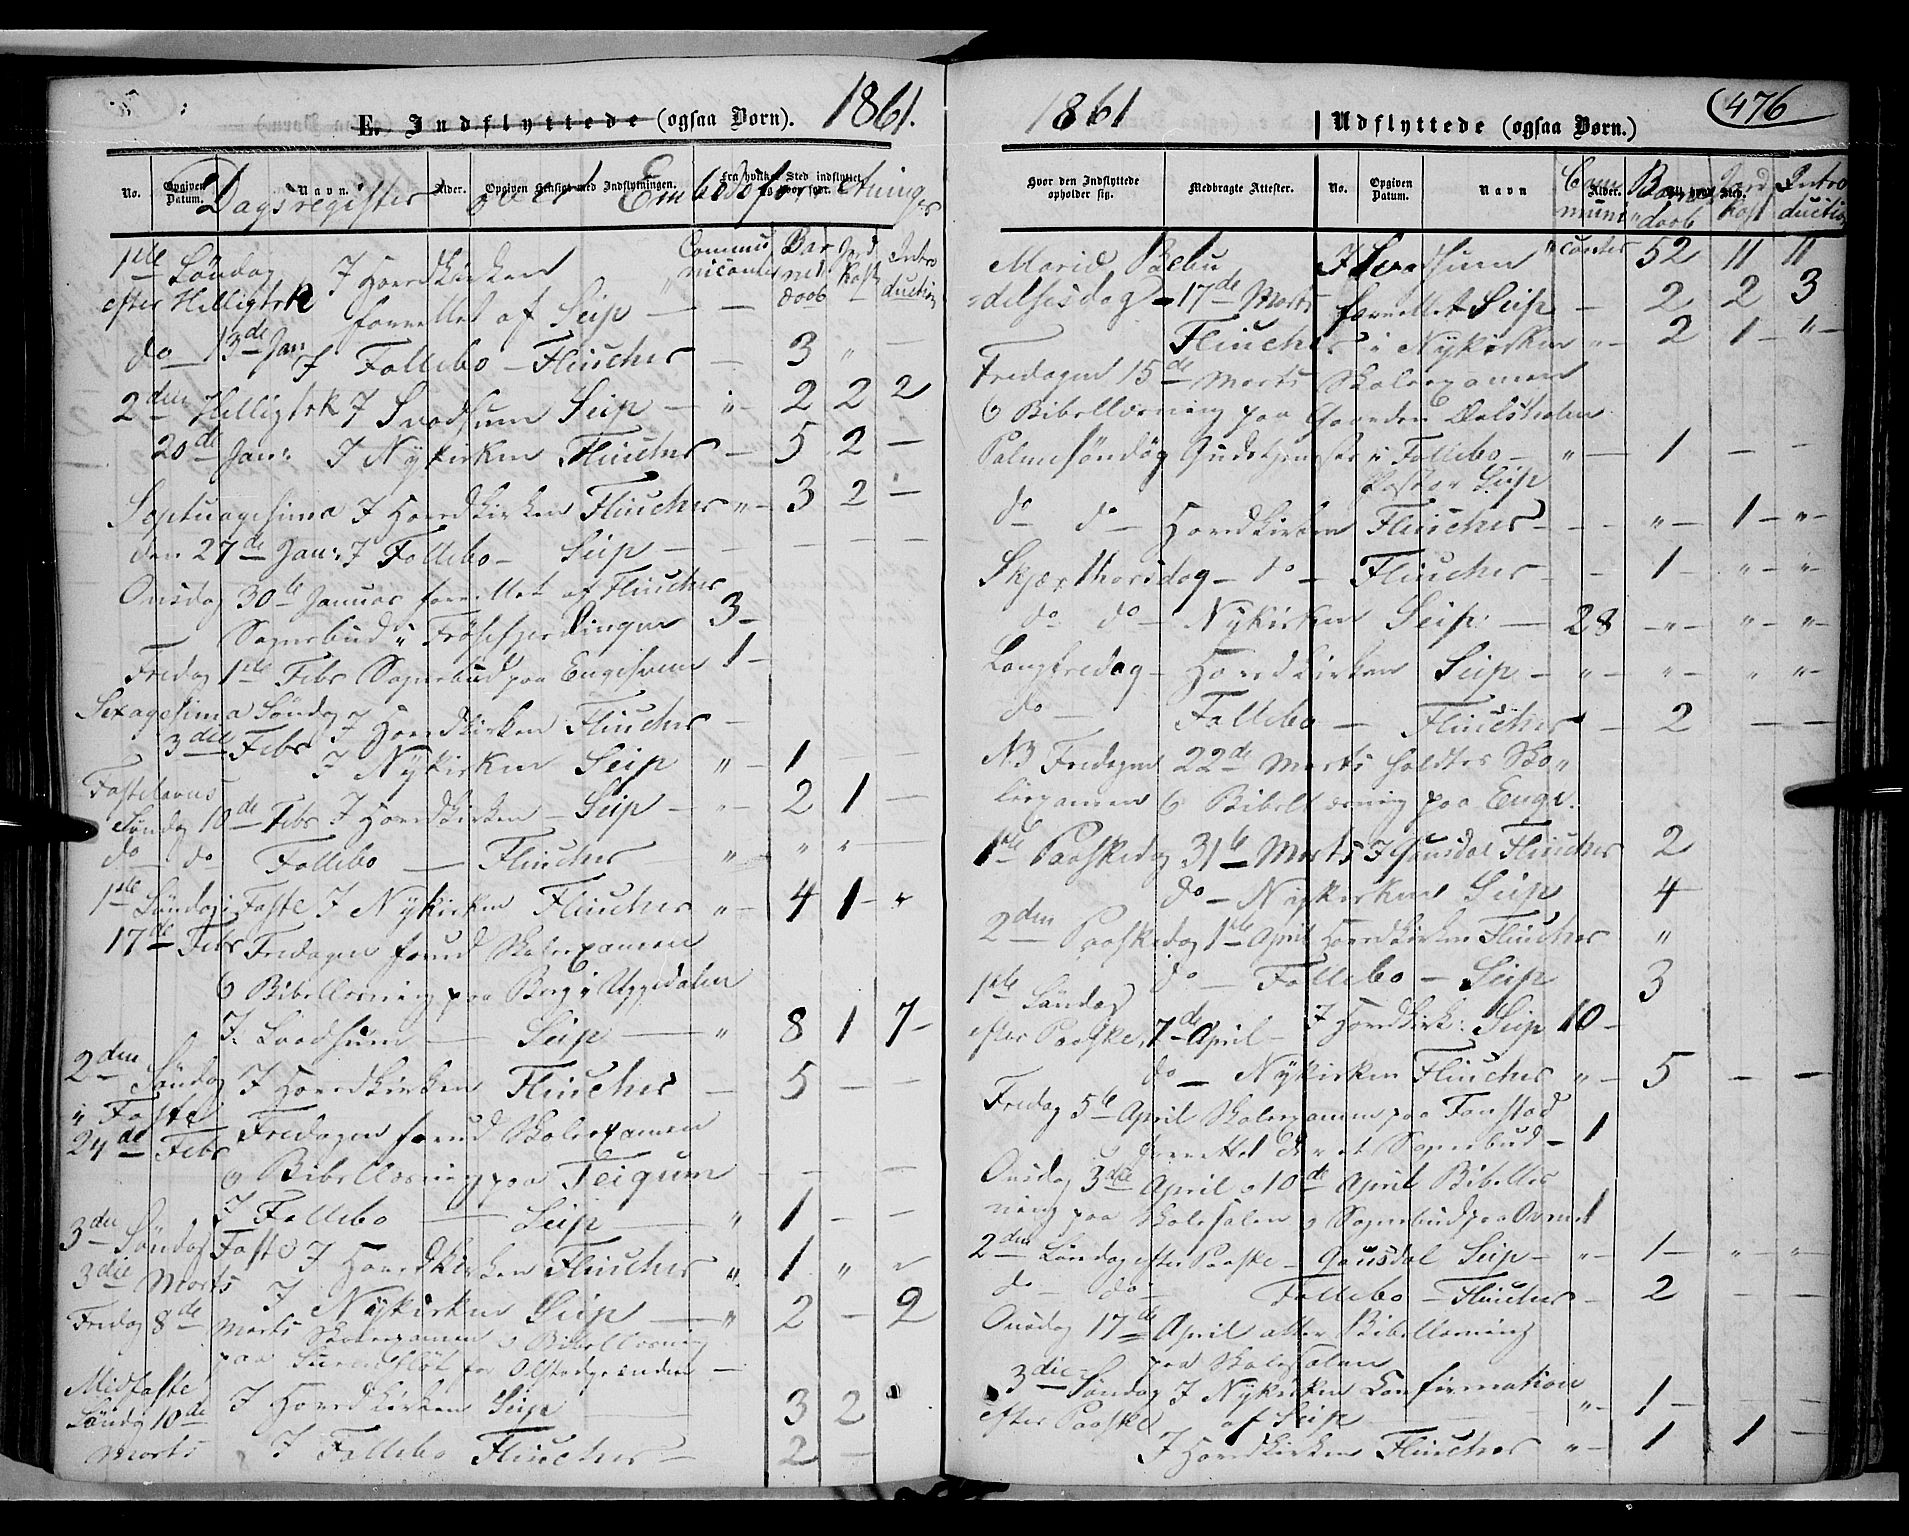 SAH, Gausdal prestekontor, Ministerialbok nr. 8, 1850-1861, s. 476